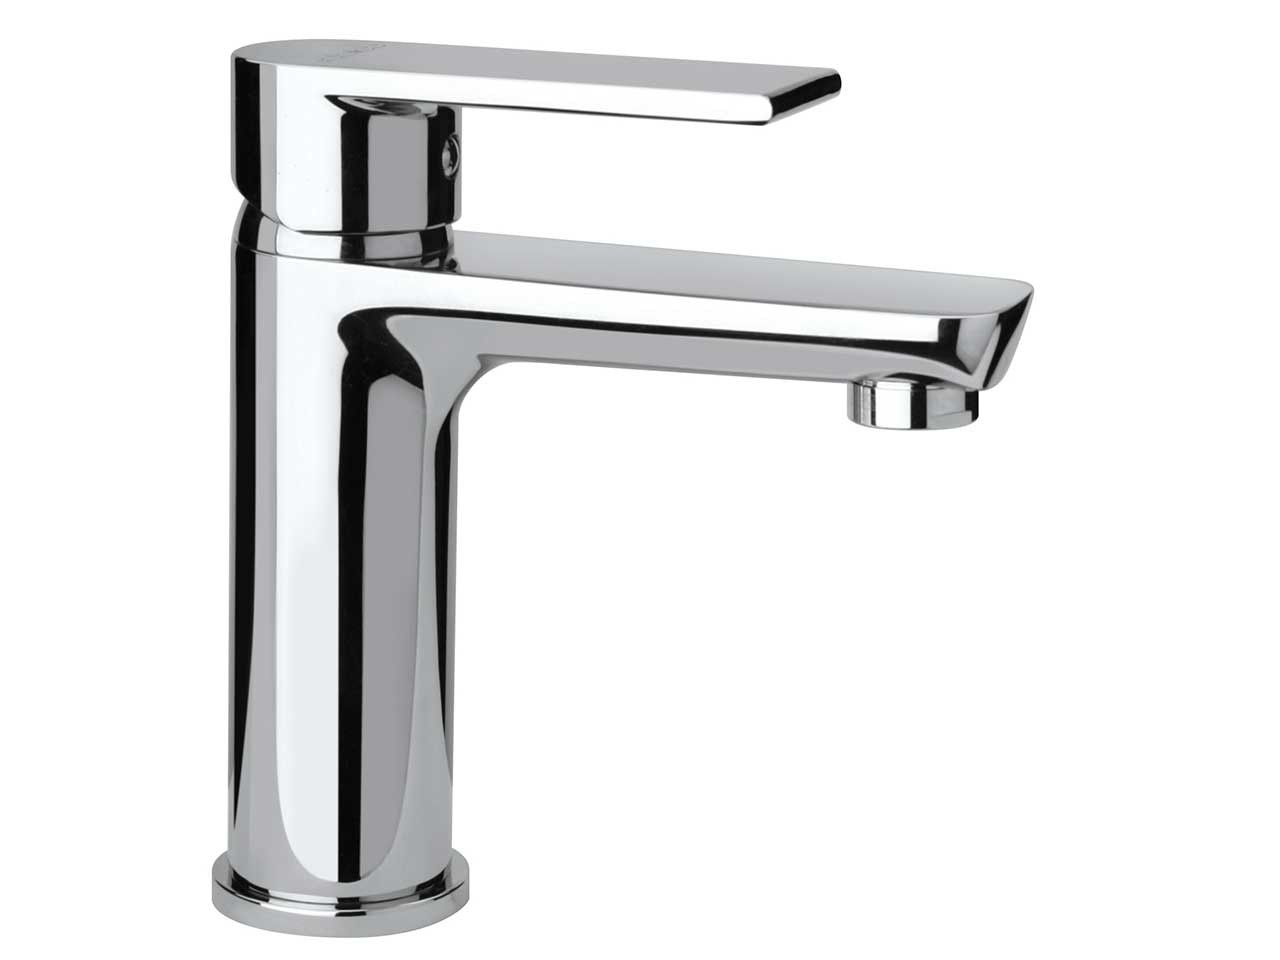 "Sanitari Scala Ideal Standard noemi monoc. lavabo sc. hostaf 1,14"" cro - iperceramica"